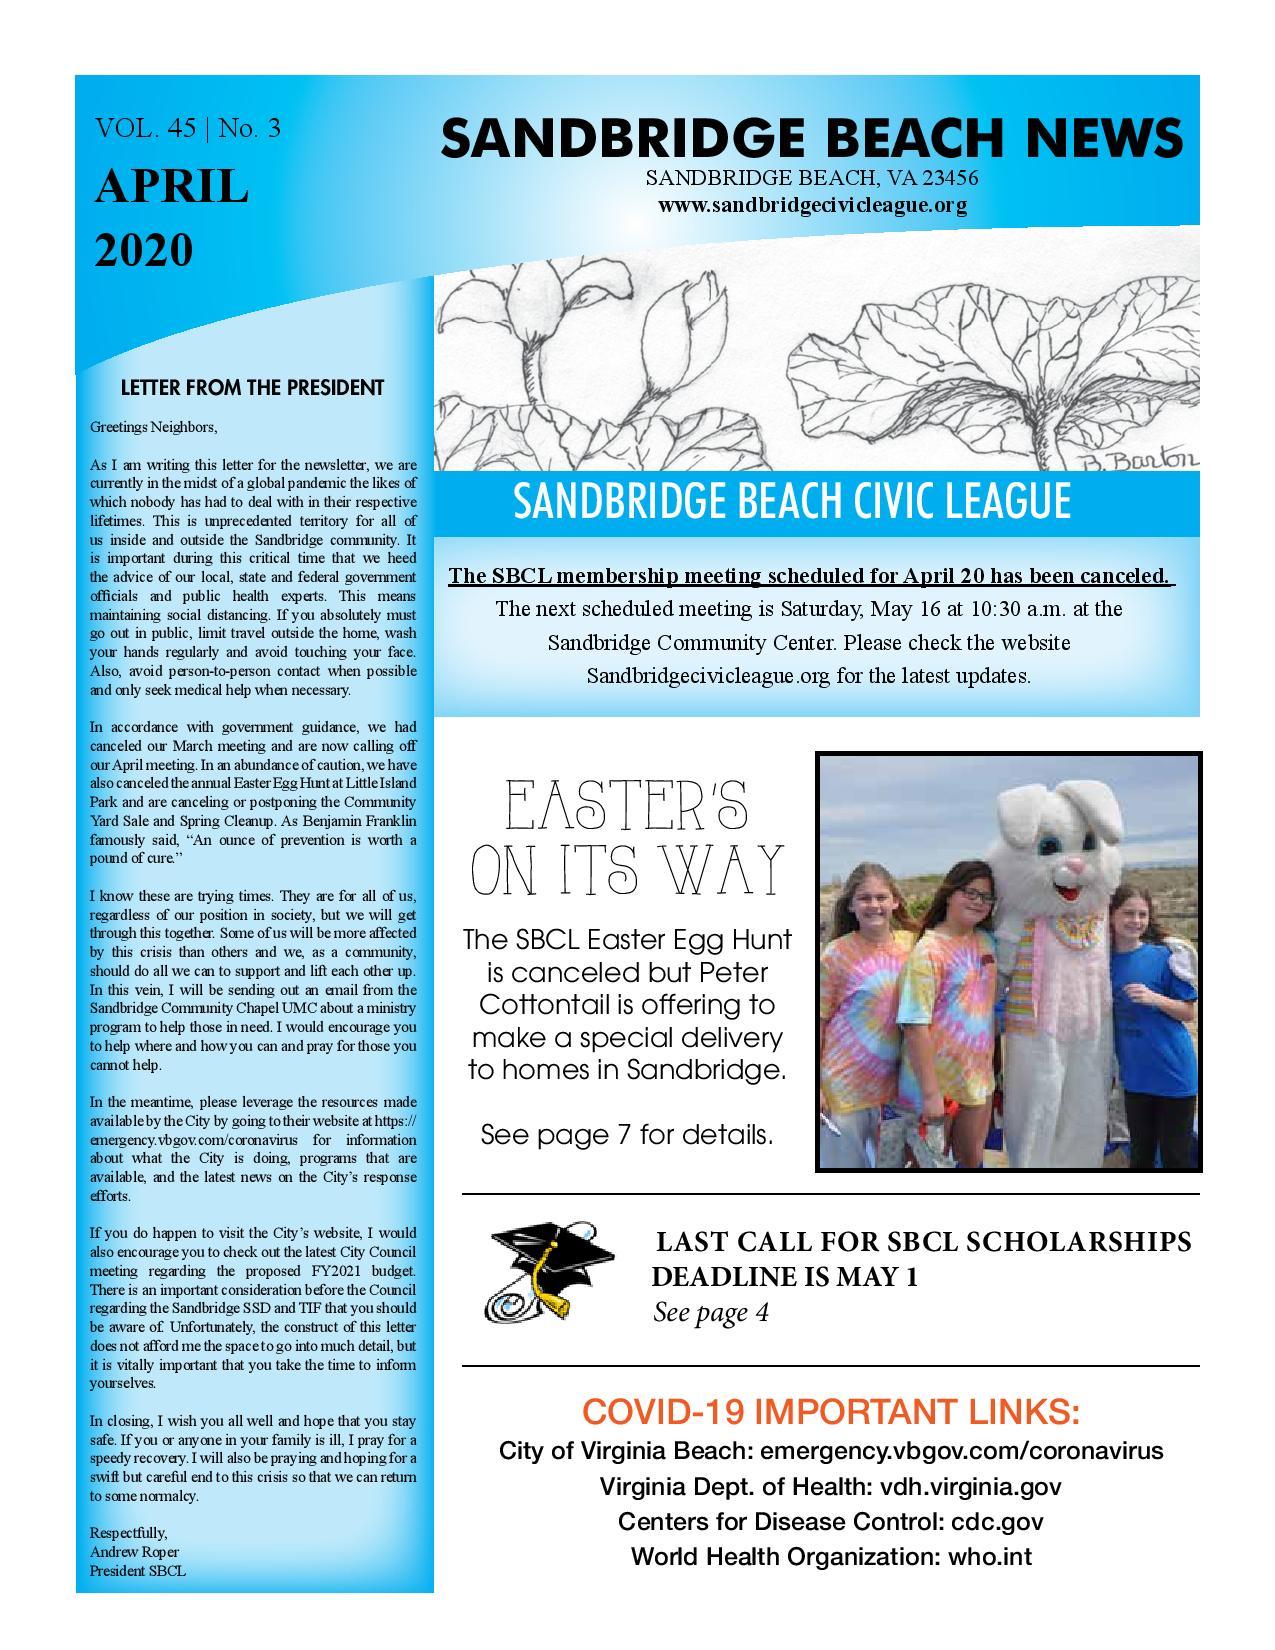 SBCL Newsletter April 2020